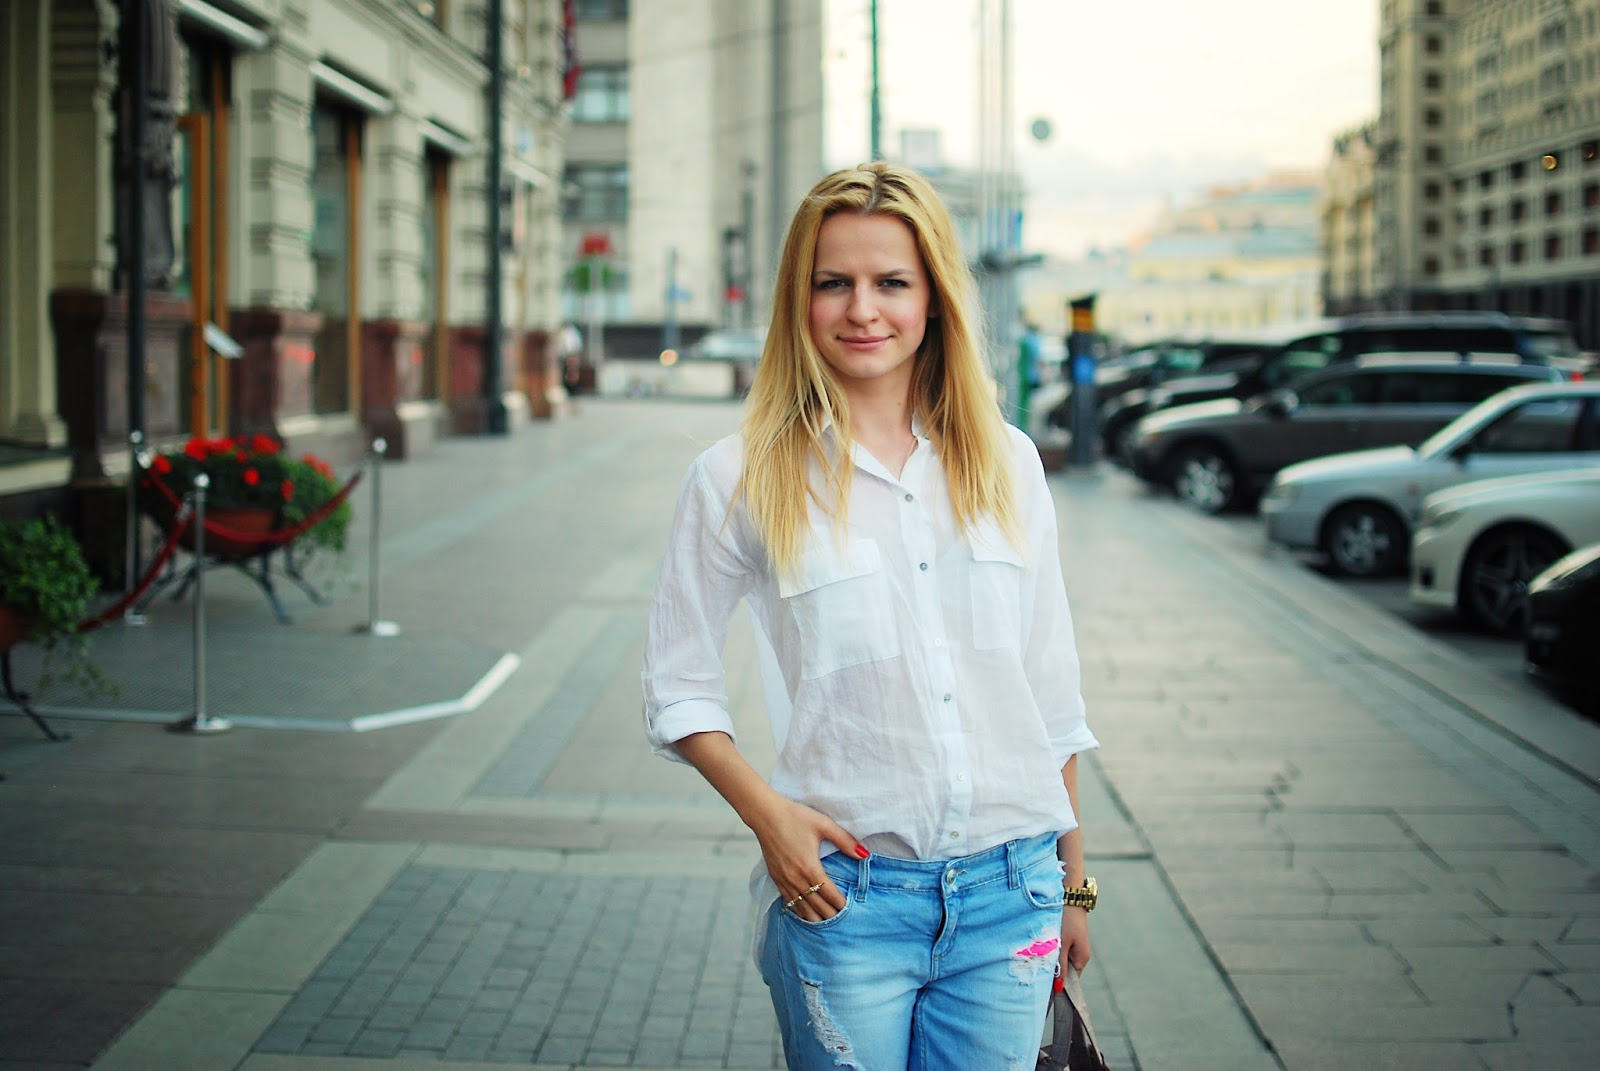 ripped jeans, denim look, blog moda, blog costa,лук с джинсами, рваные джинсы